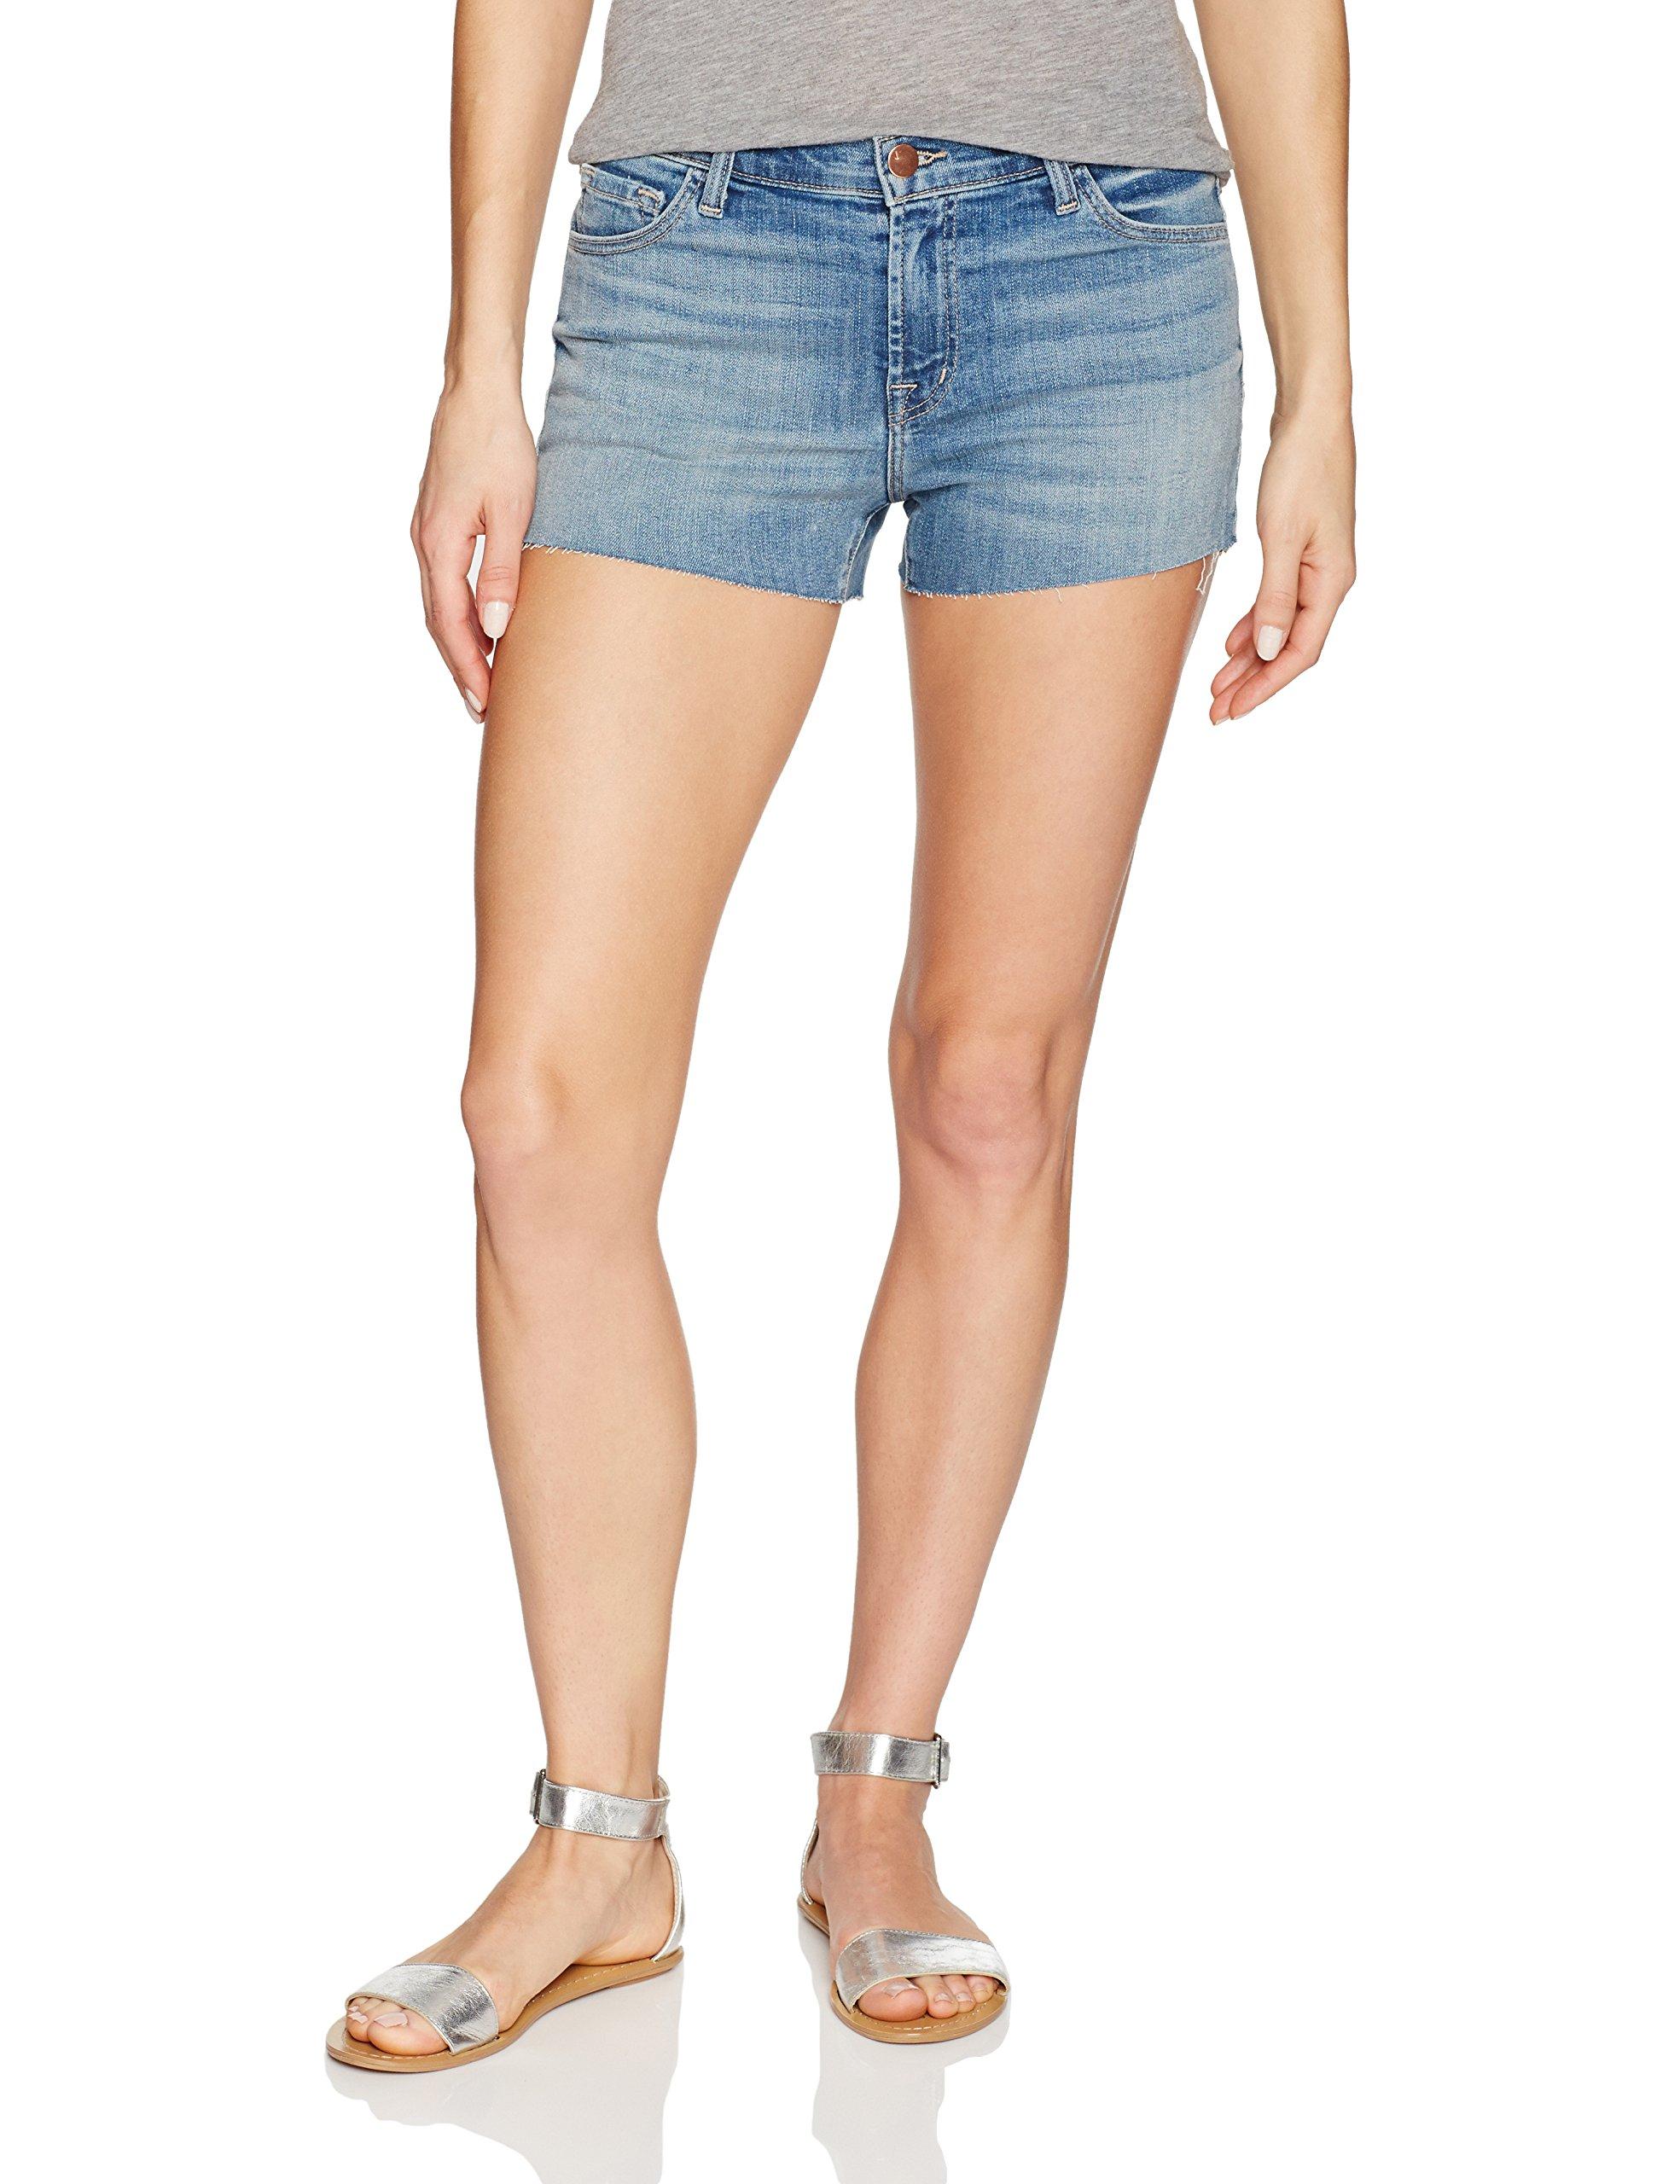 J Brand Jeans Women's 1044 Mid Rise Short, Adventure, 27